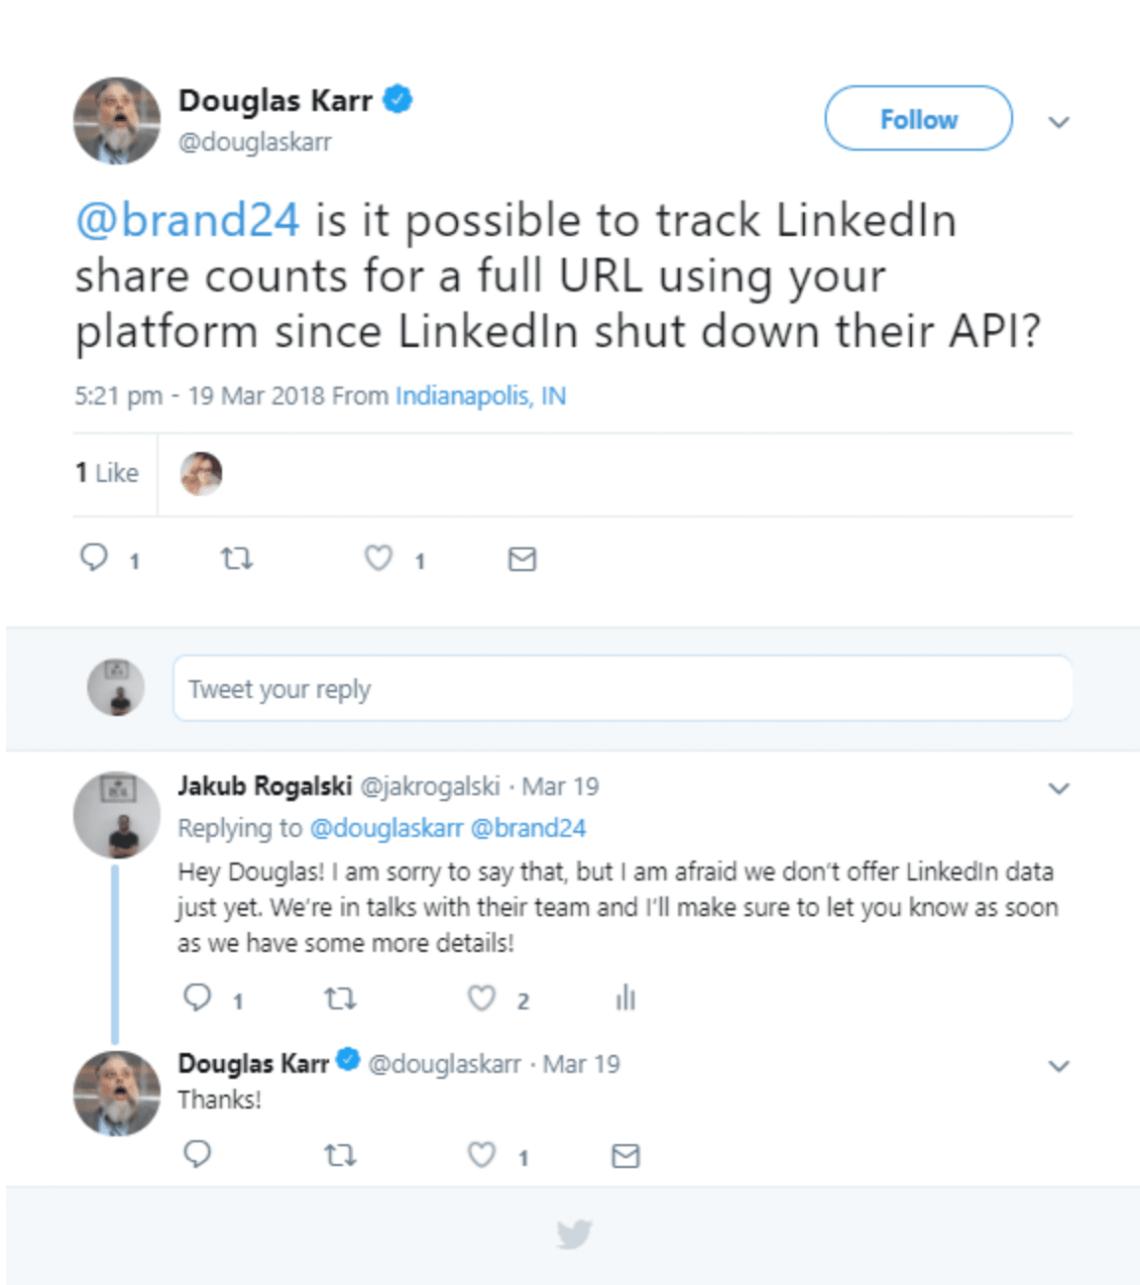 screen shot of twitter interaction